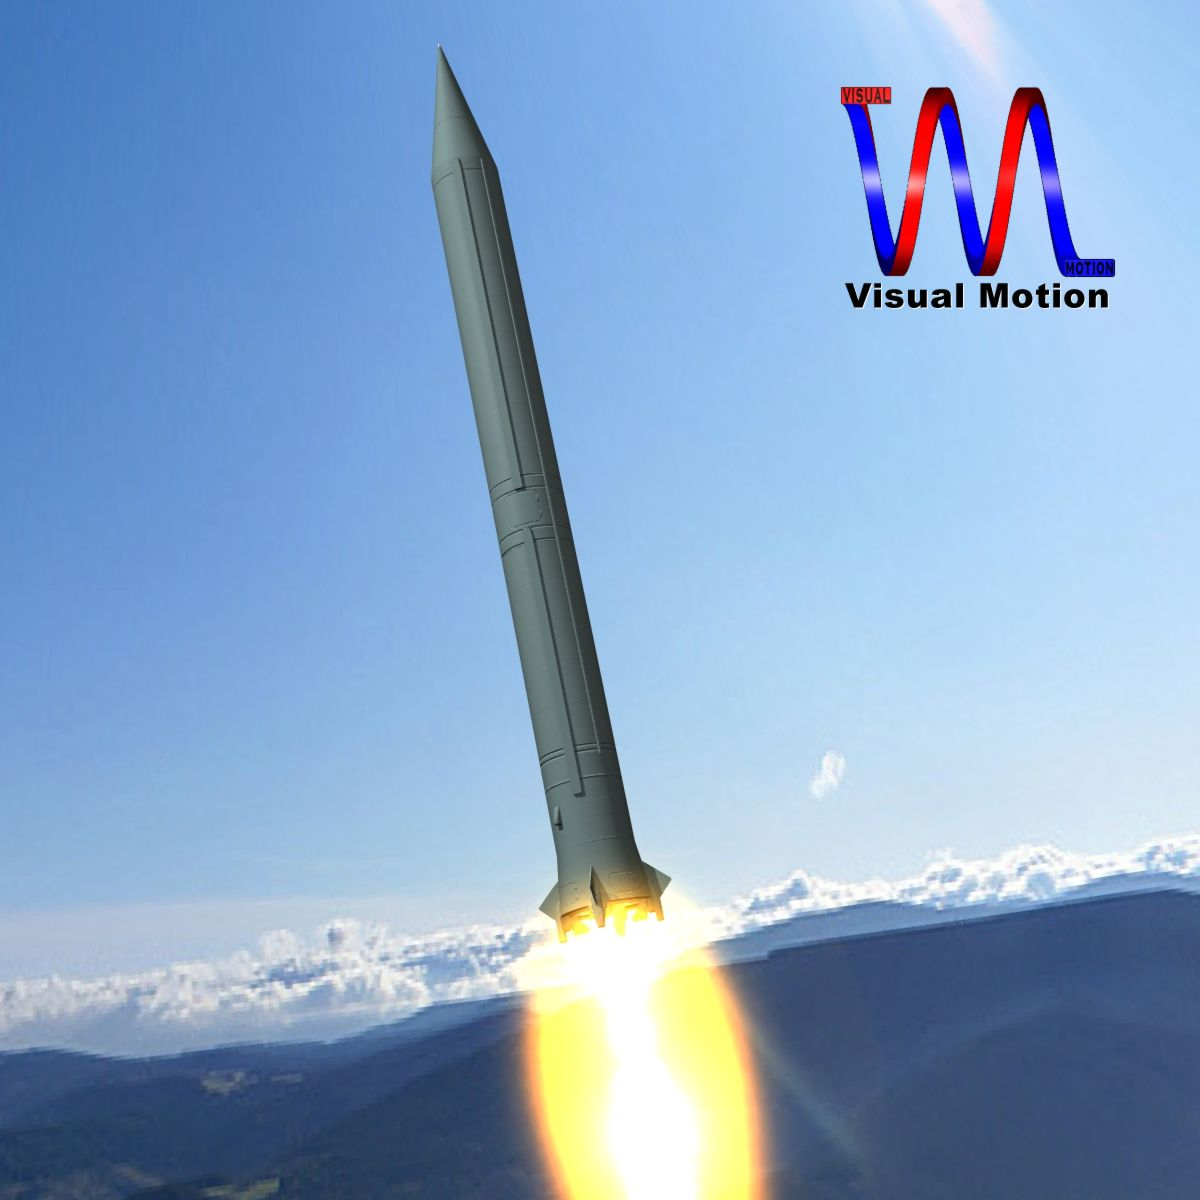 russian ss-4 sandel missile 3d model 3ds dxf x cod scn obj 149740